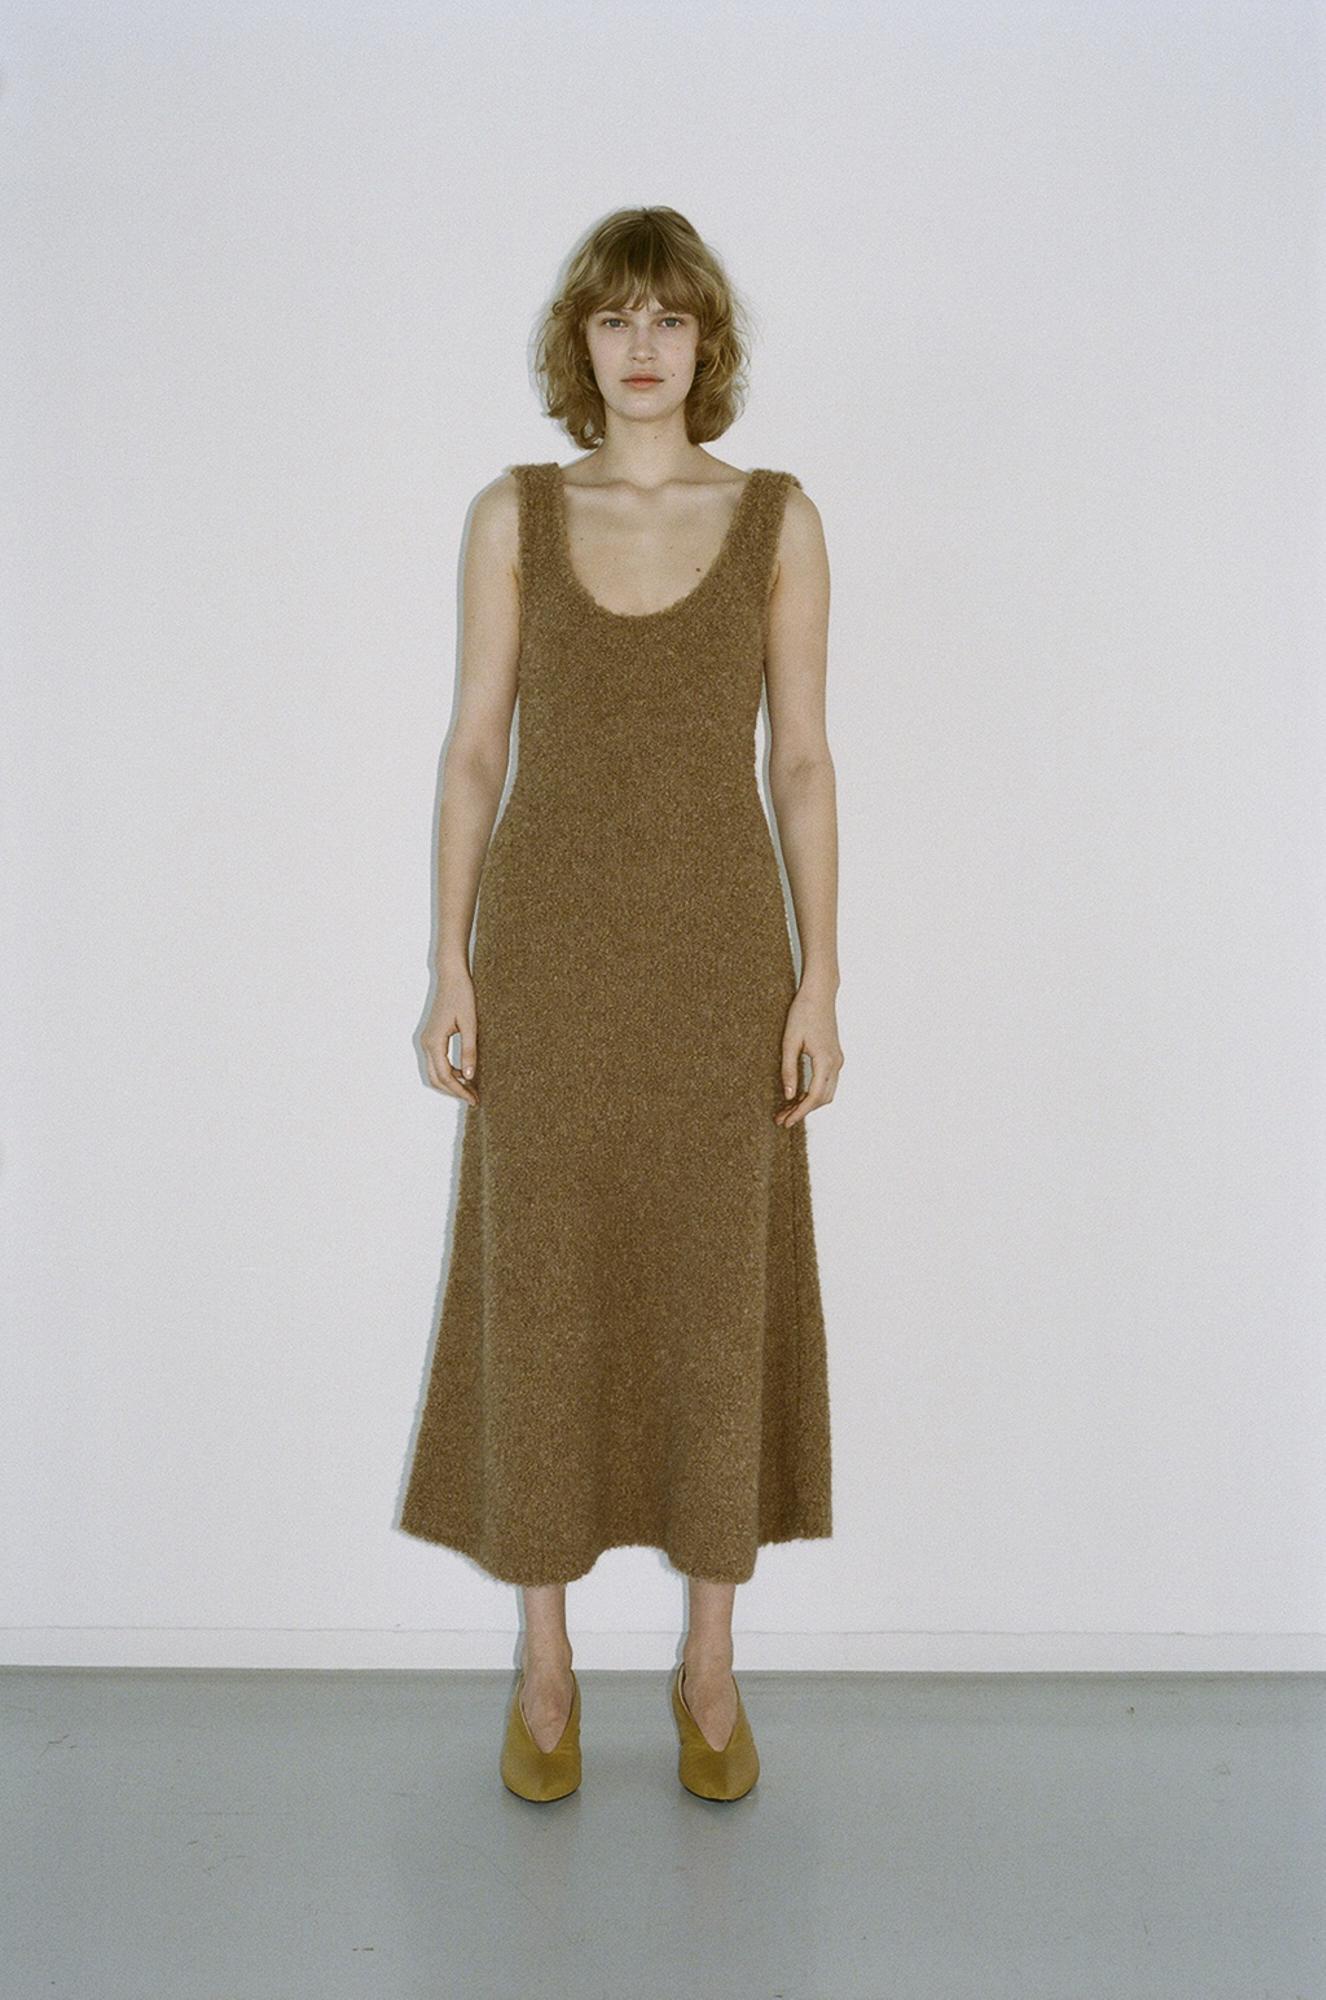 GAUCHERE Fall Winter 2021 Paris Fashion Week LOOK 5 Knit Dress TIBELIA, Shoes PILLOW PUMP